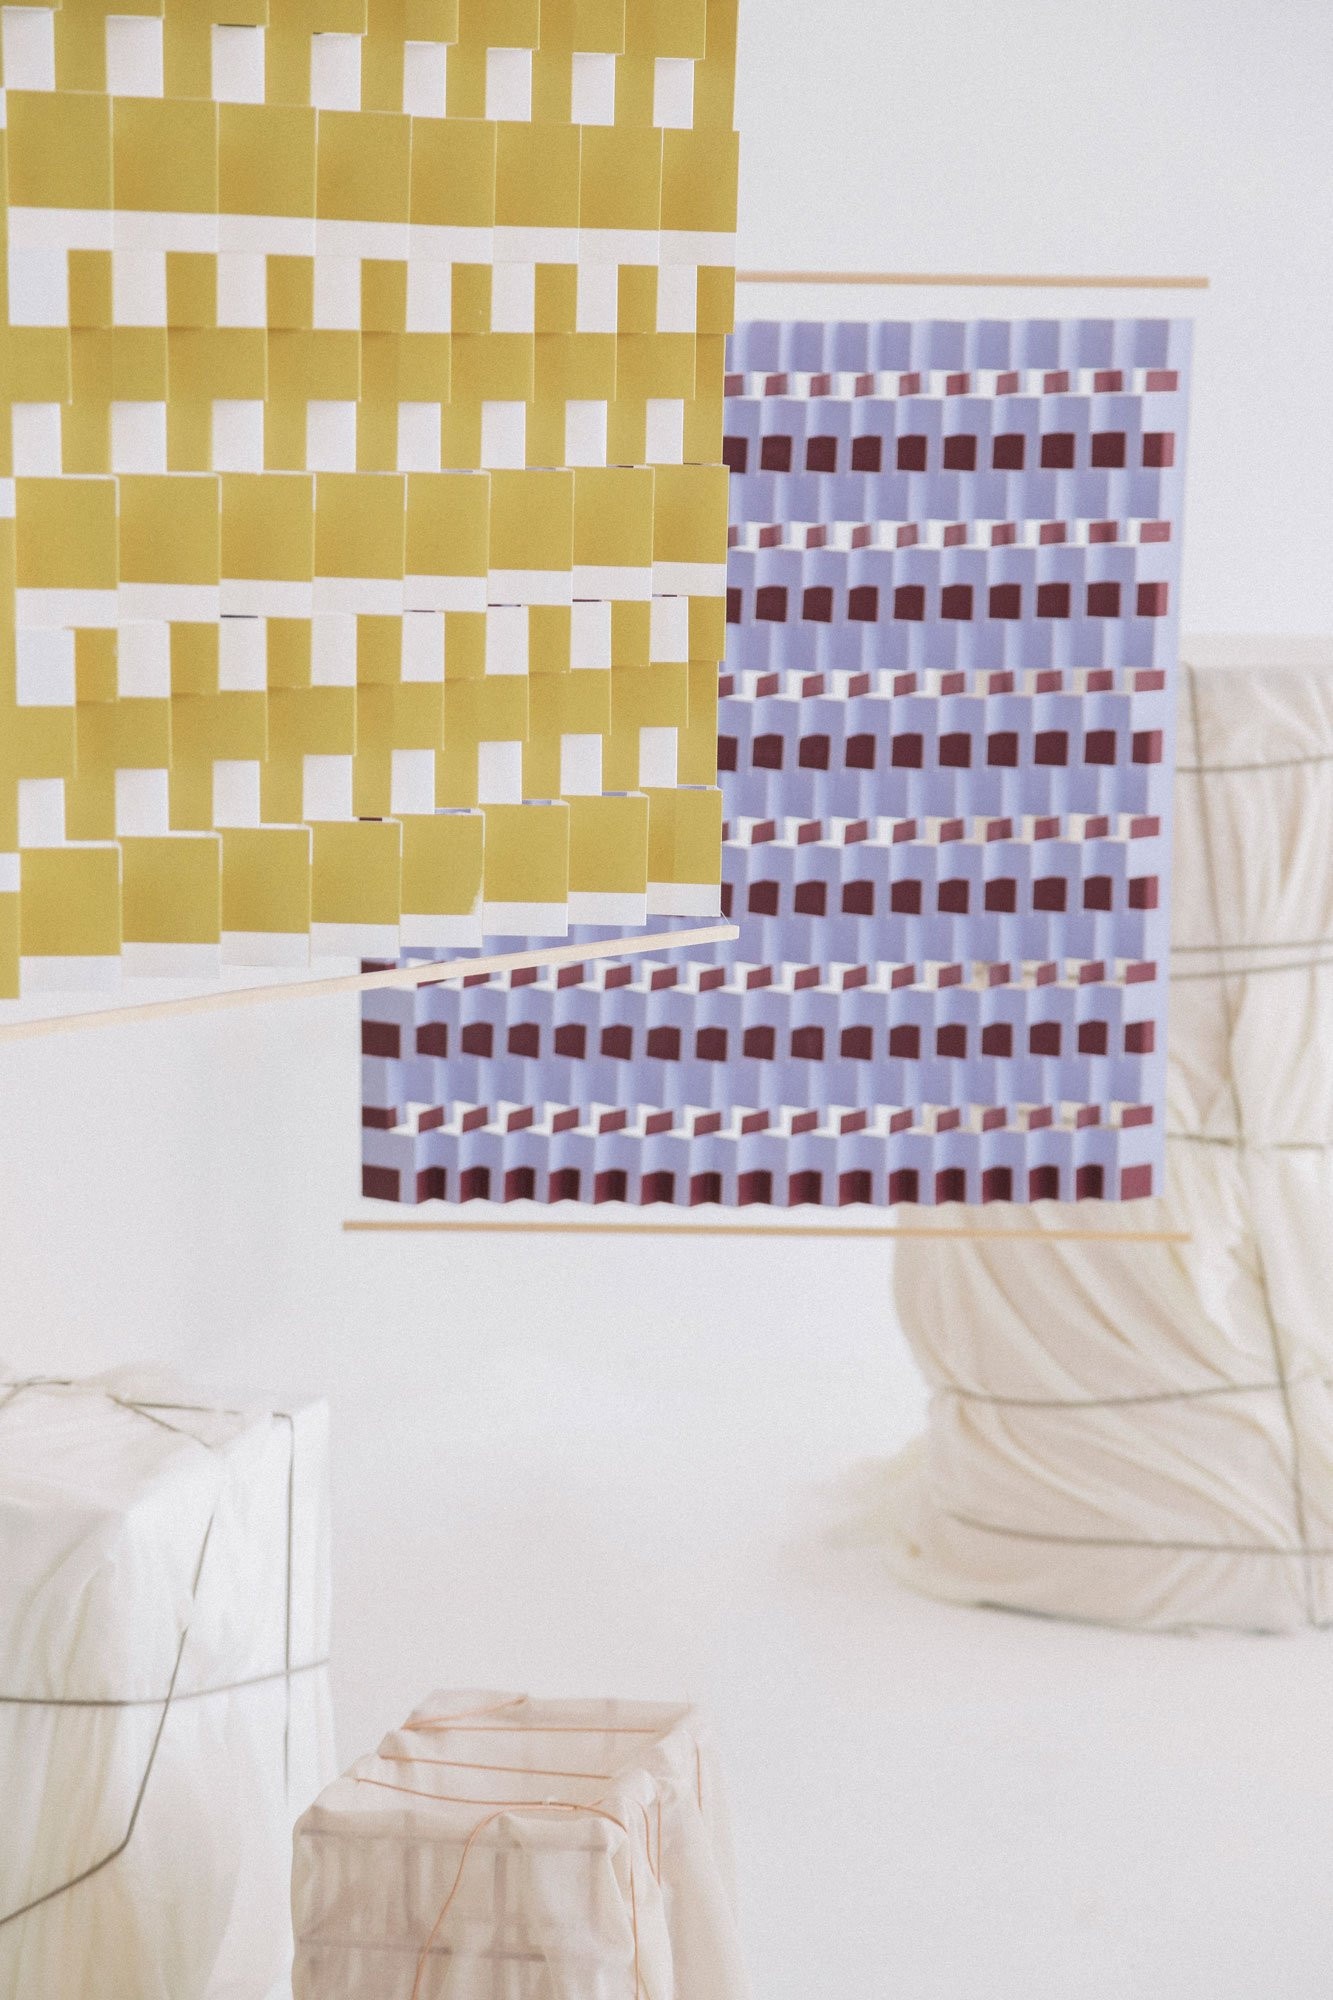 Ukurant Objects, 3daysofdesign 2020, jeunes designers, Tronhjem Romer